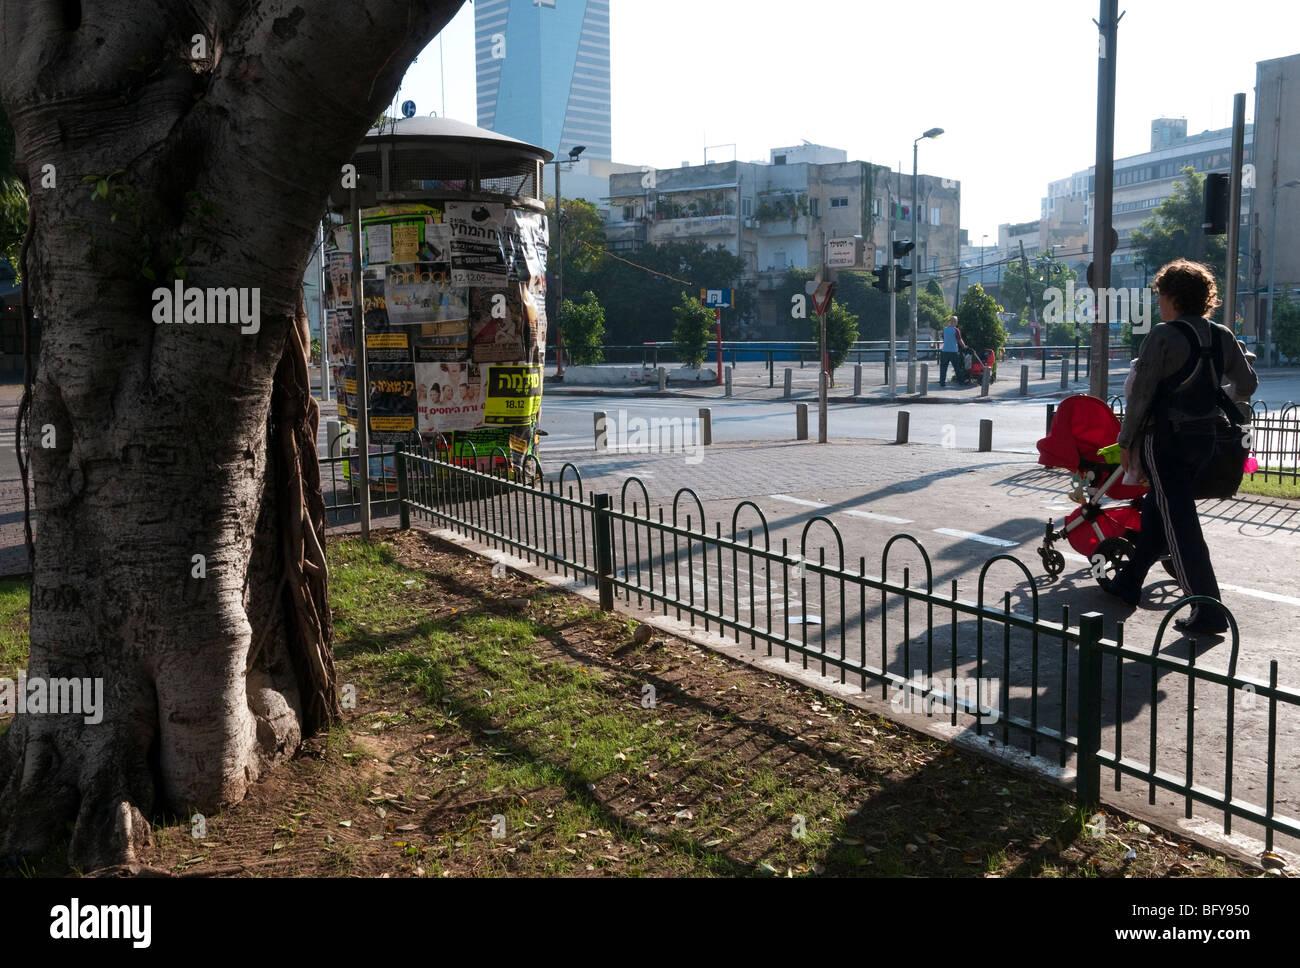 Rothschild boulevard pedestrian promenade in Tel Aviv. mother with pushchair enjoying a morning stroll on saturday - Stock Image